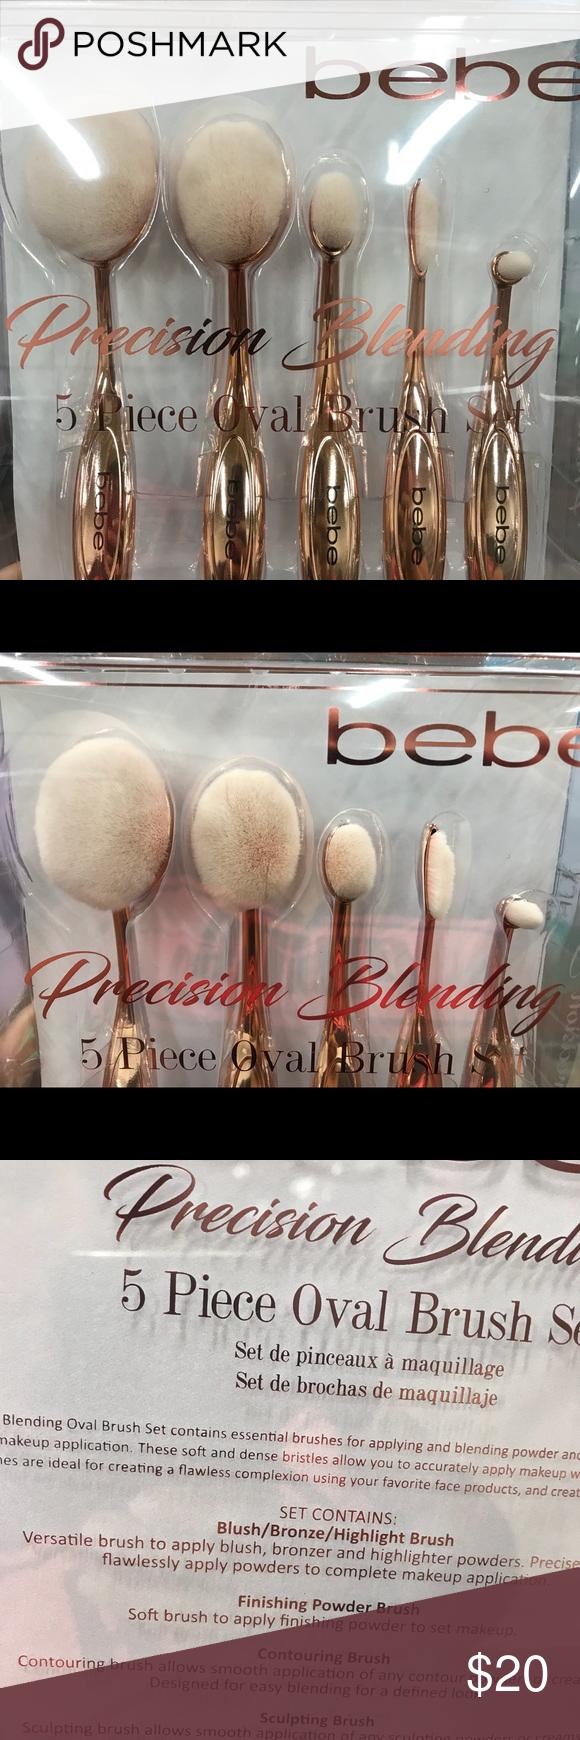 New! Bebe Make up bushes 5 pc Set NWT (With images) Bebe